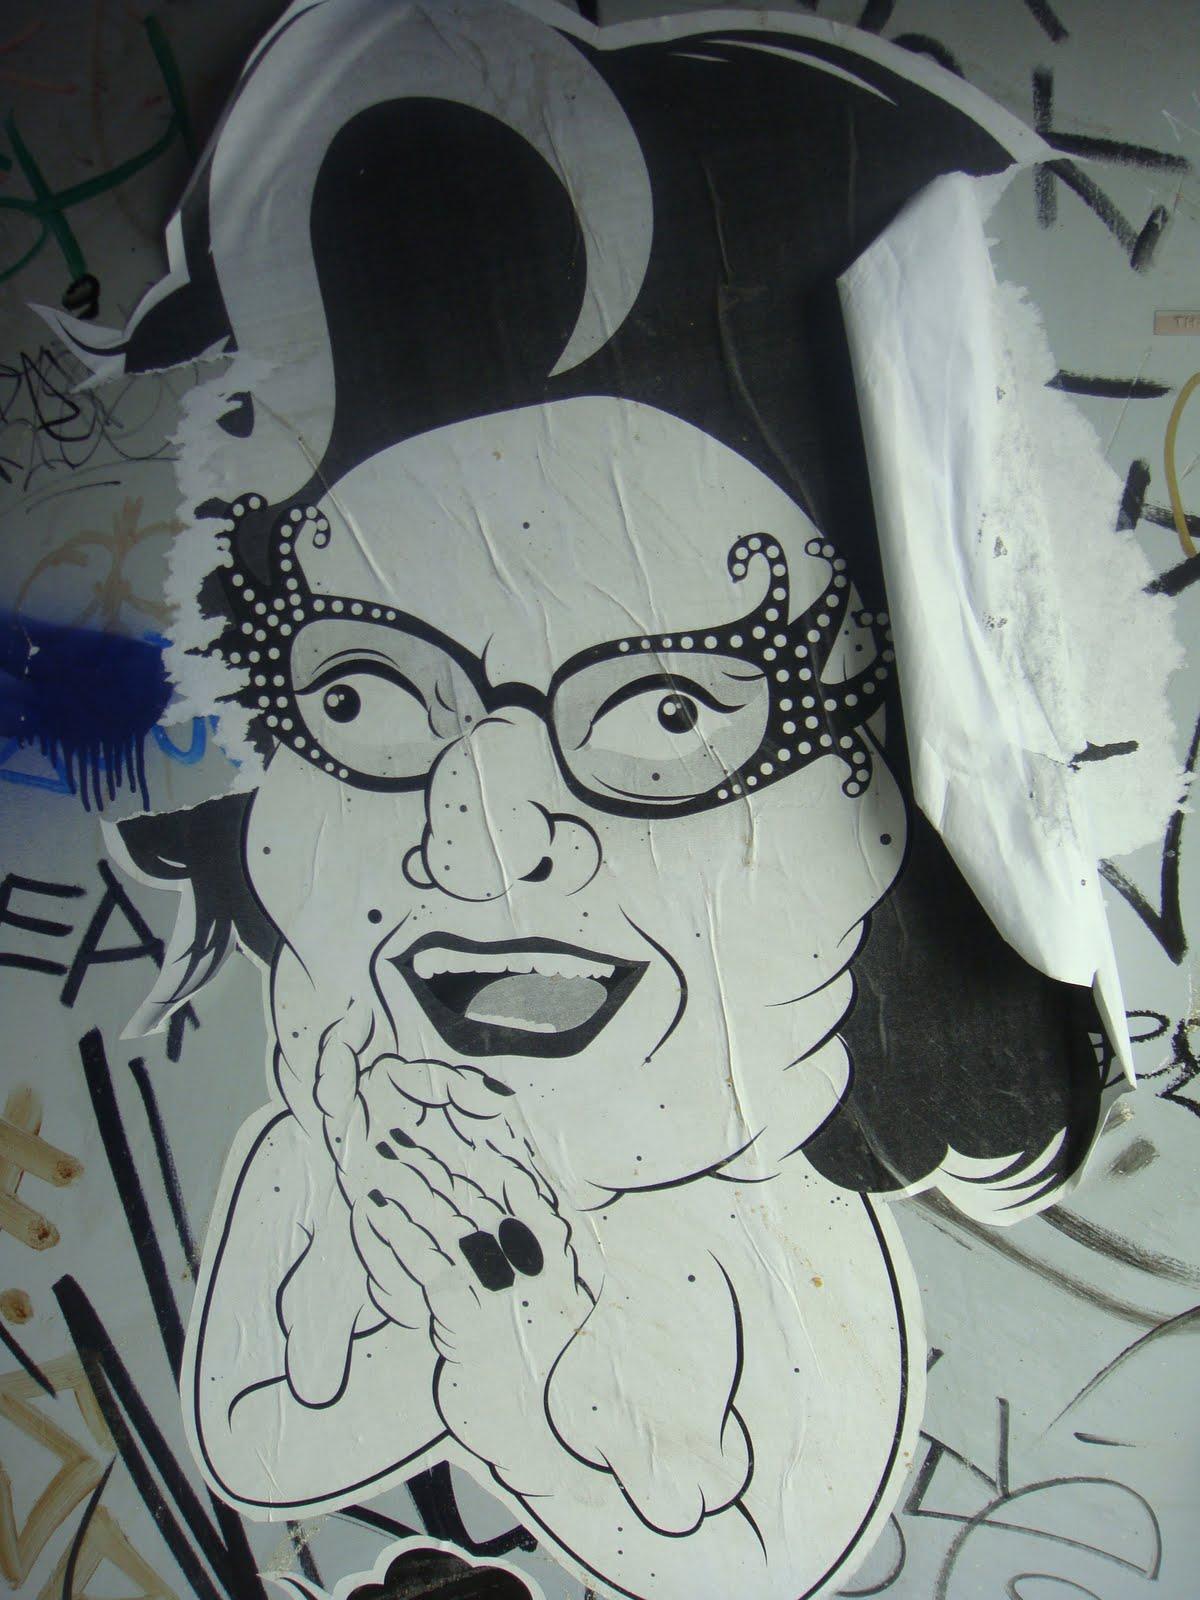 Claire Celebrity: Audrey Hepburn's wardrobe in